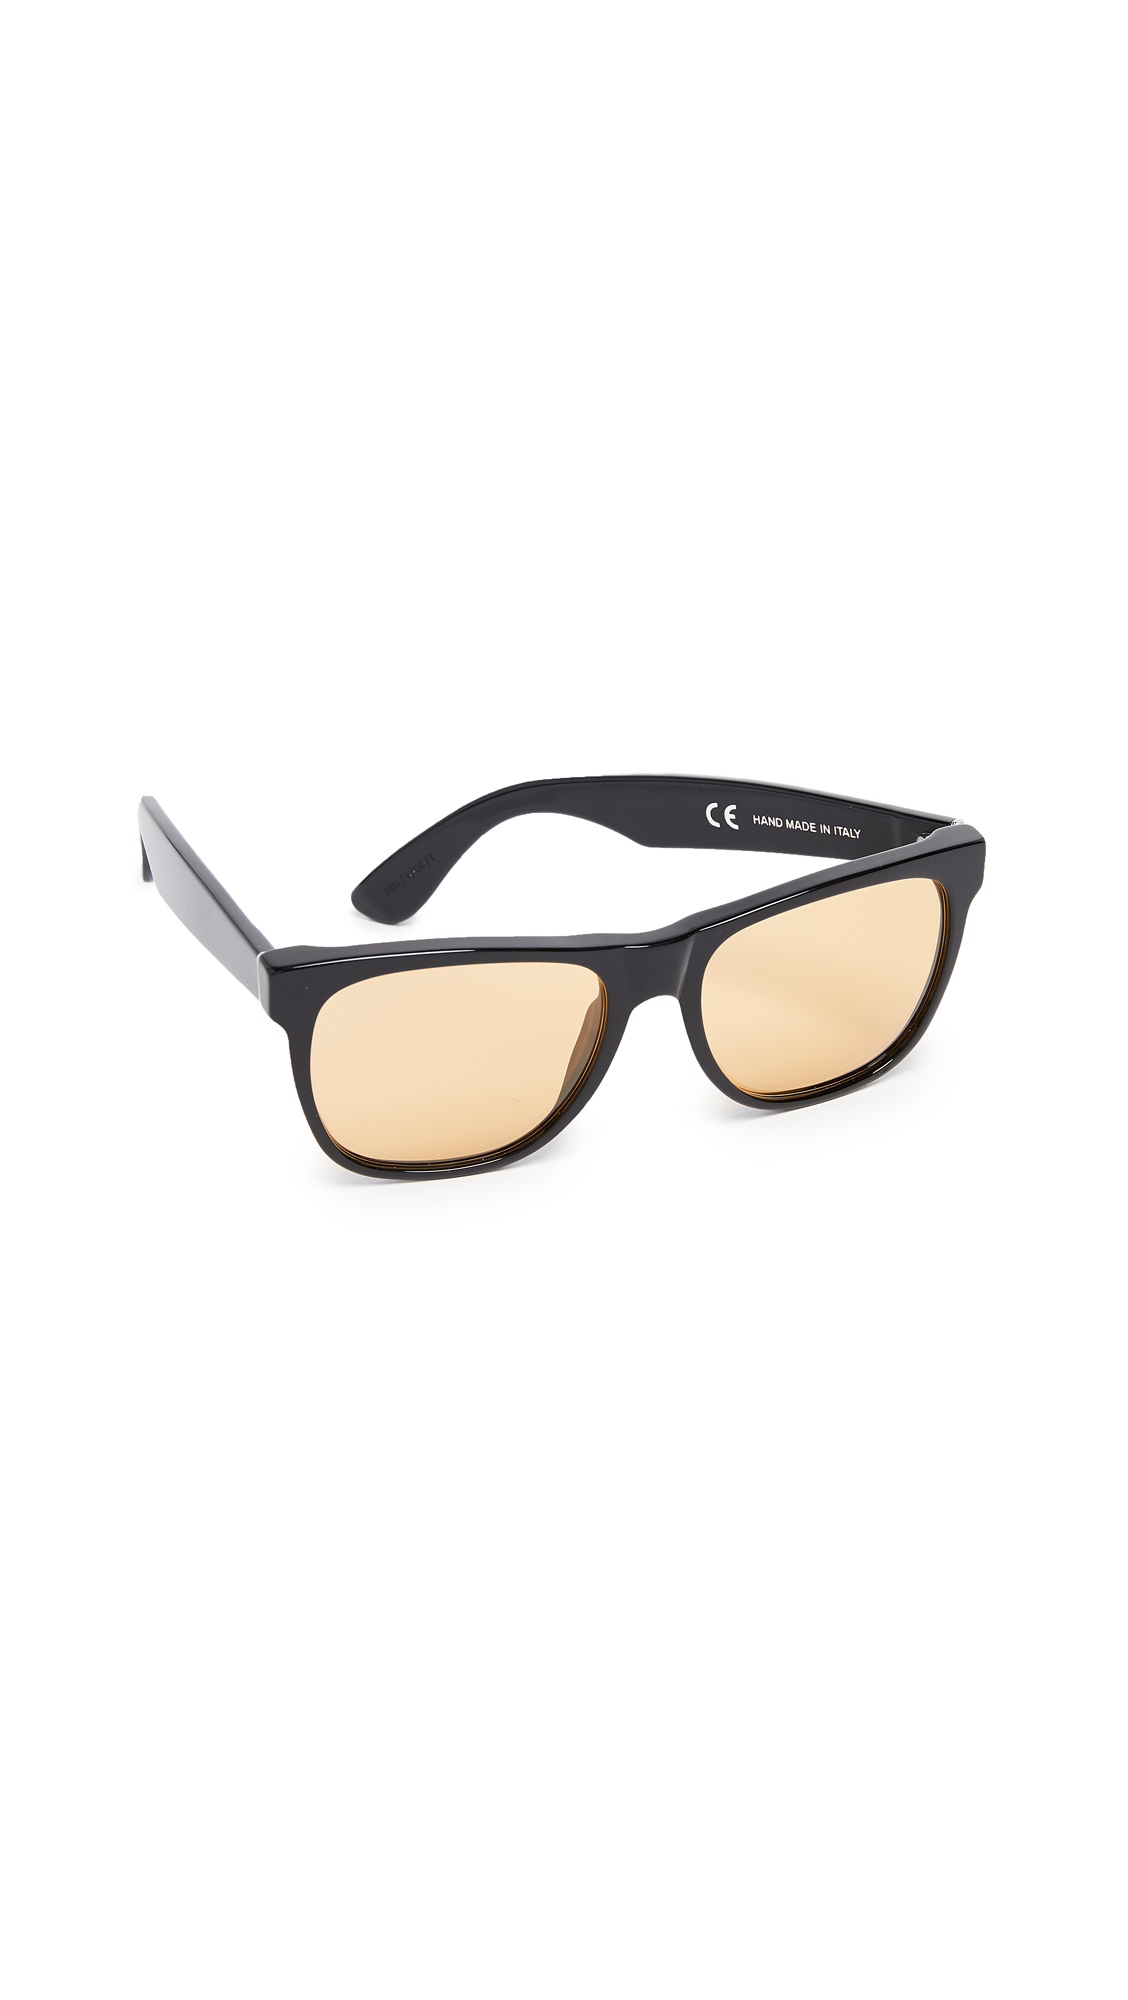 SUPER SUNGLASSES Classic Sunglasses in Mustard